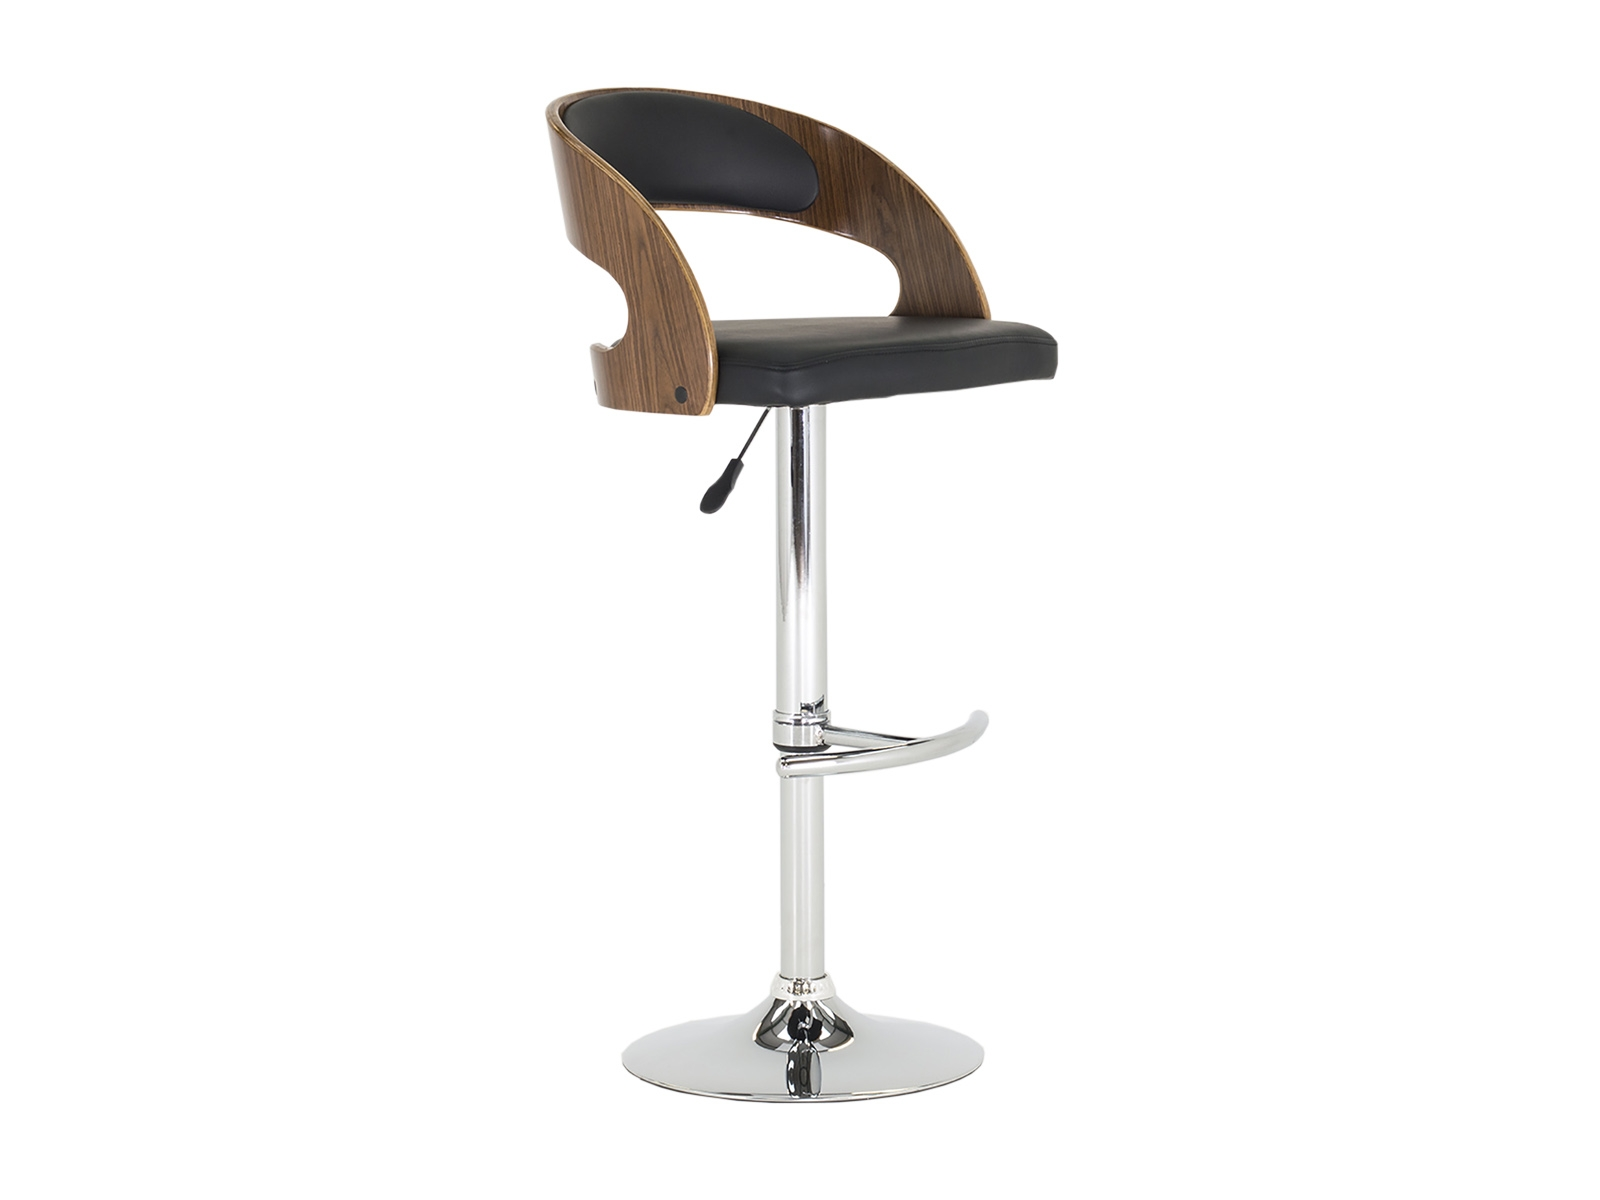 Scaun de bar tapitat cu piele ecologica cu picior metalic Flair Brown / Black l46xA41xH109 cm